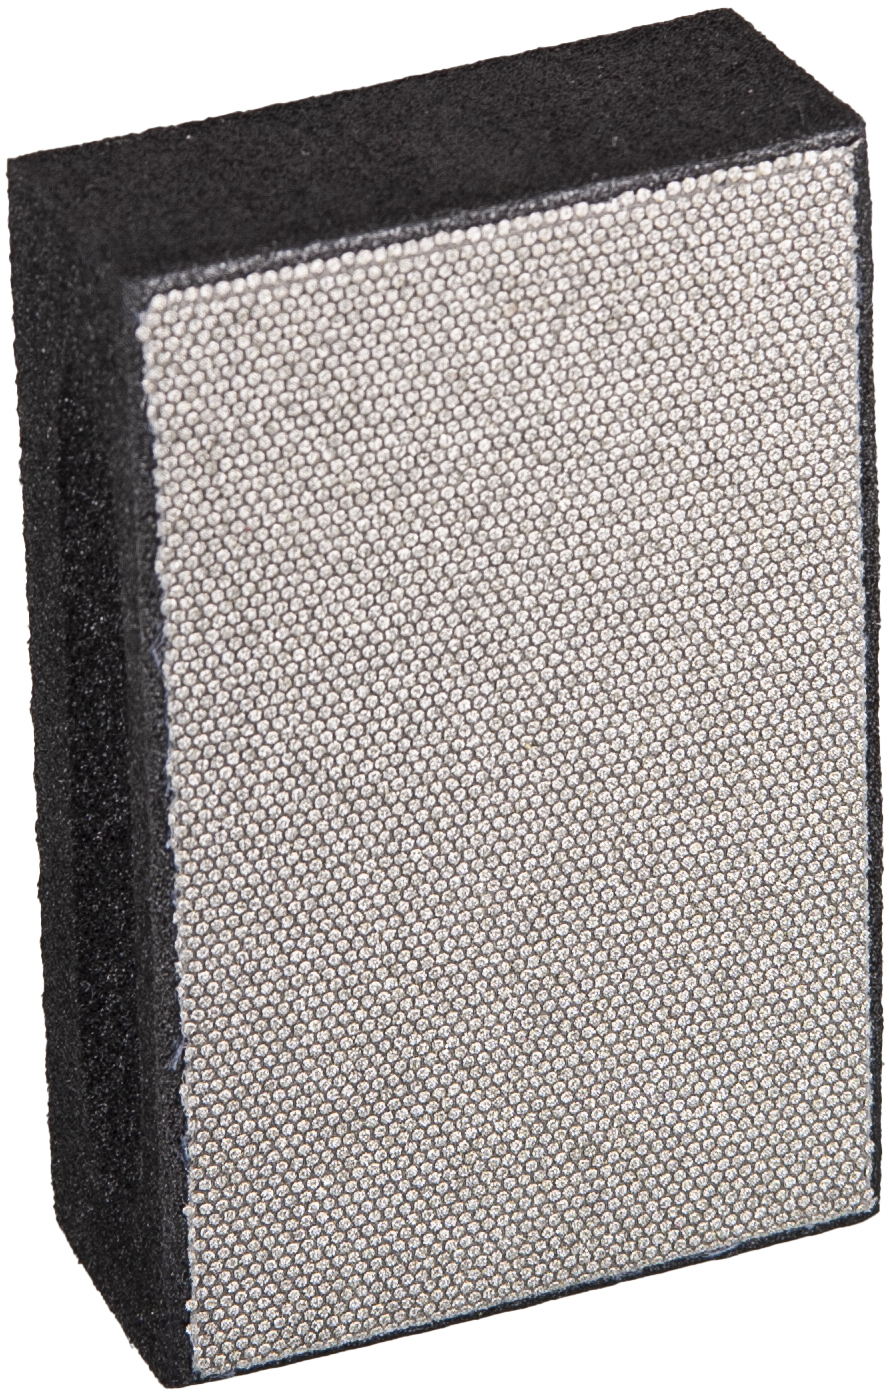 Diamant Handpad 90 x 55 mm | Korn 120